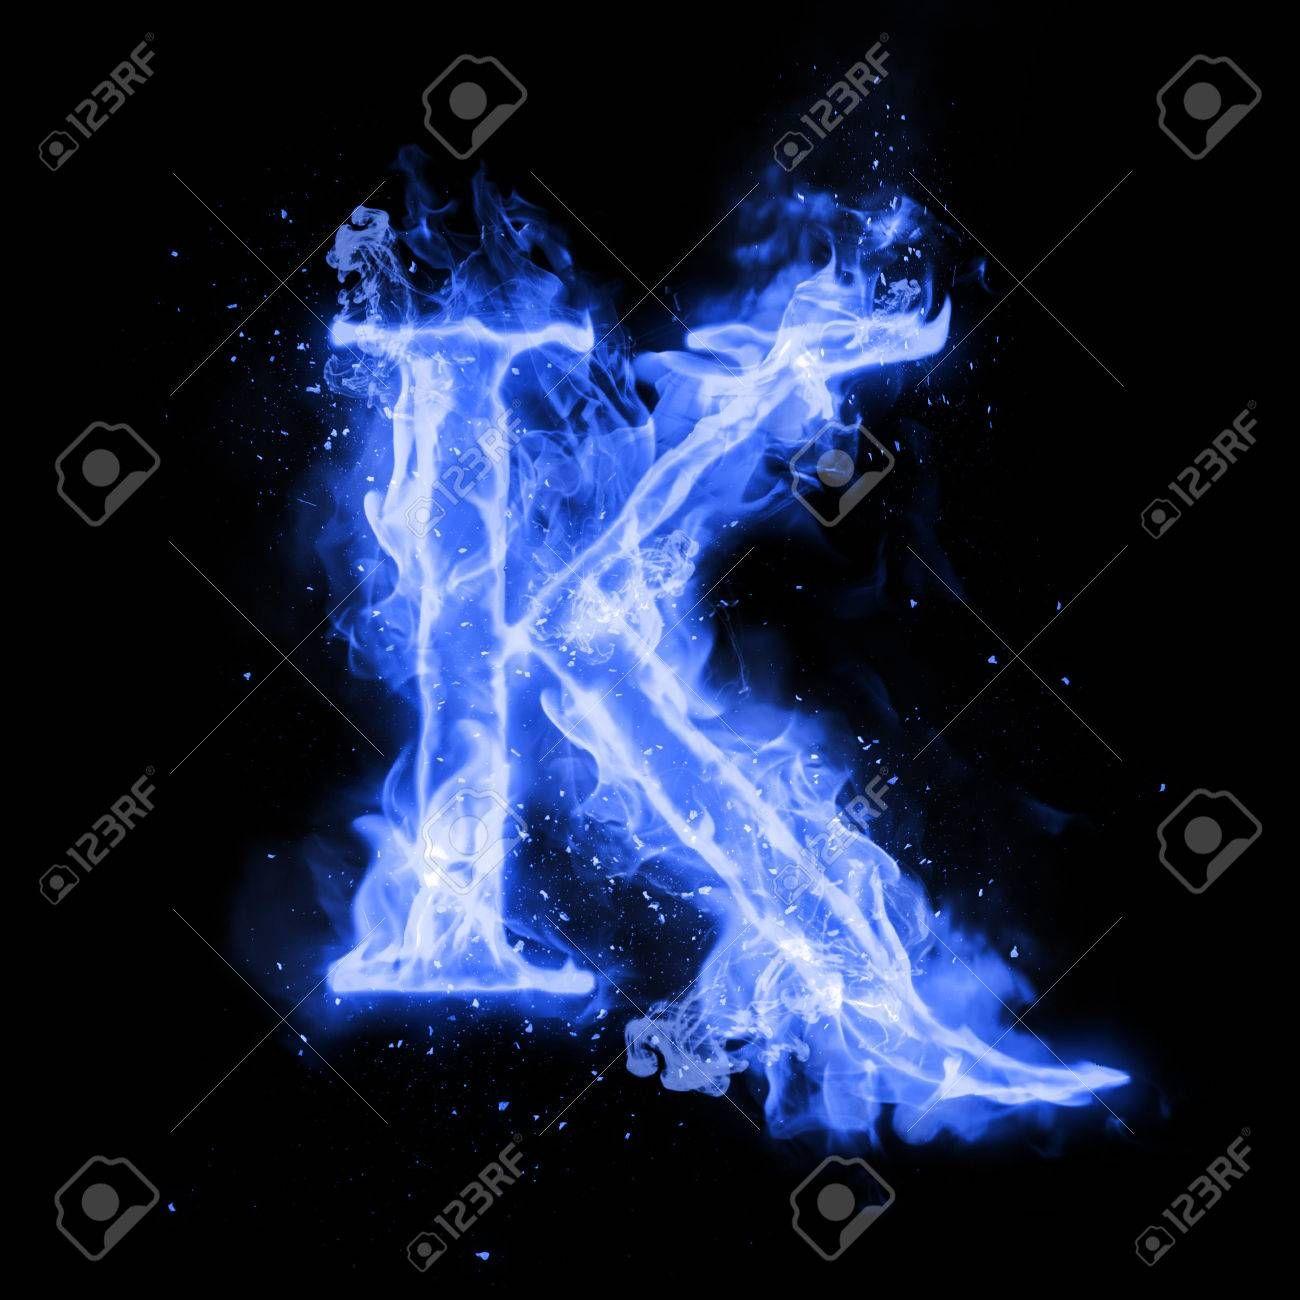 Fire Letter K Of Burning Blue Flame Flaming Burn Font Or Bonfire Alphabet Text With Sizzling Smoke And Fie Lettering Alphabet Alphabet Letters Design Letter K